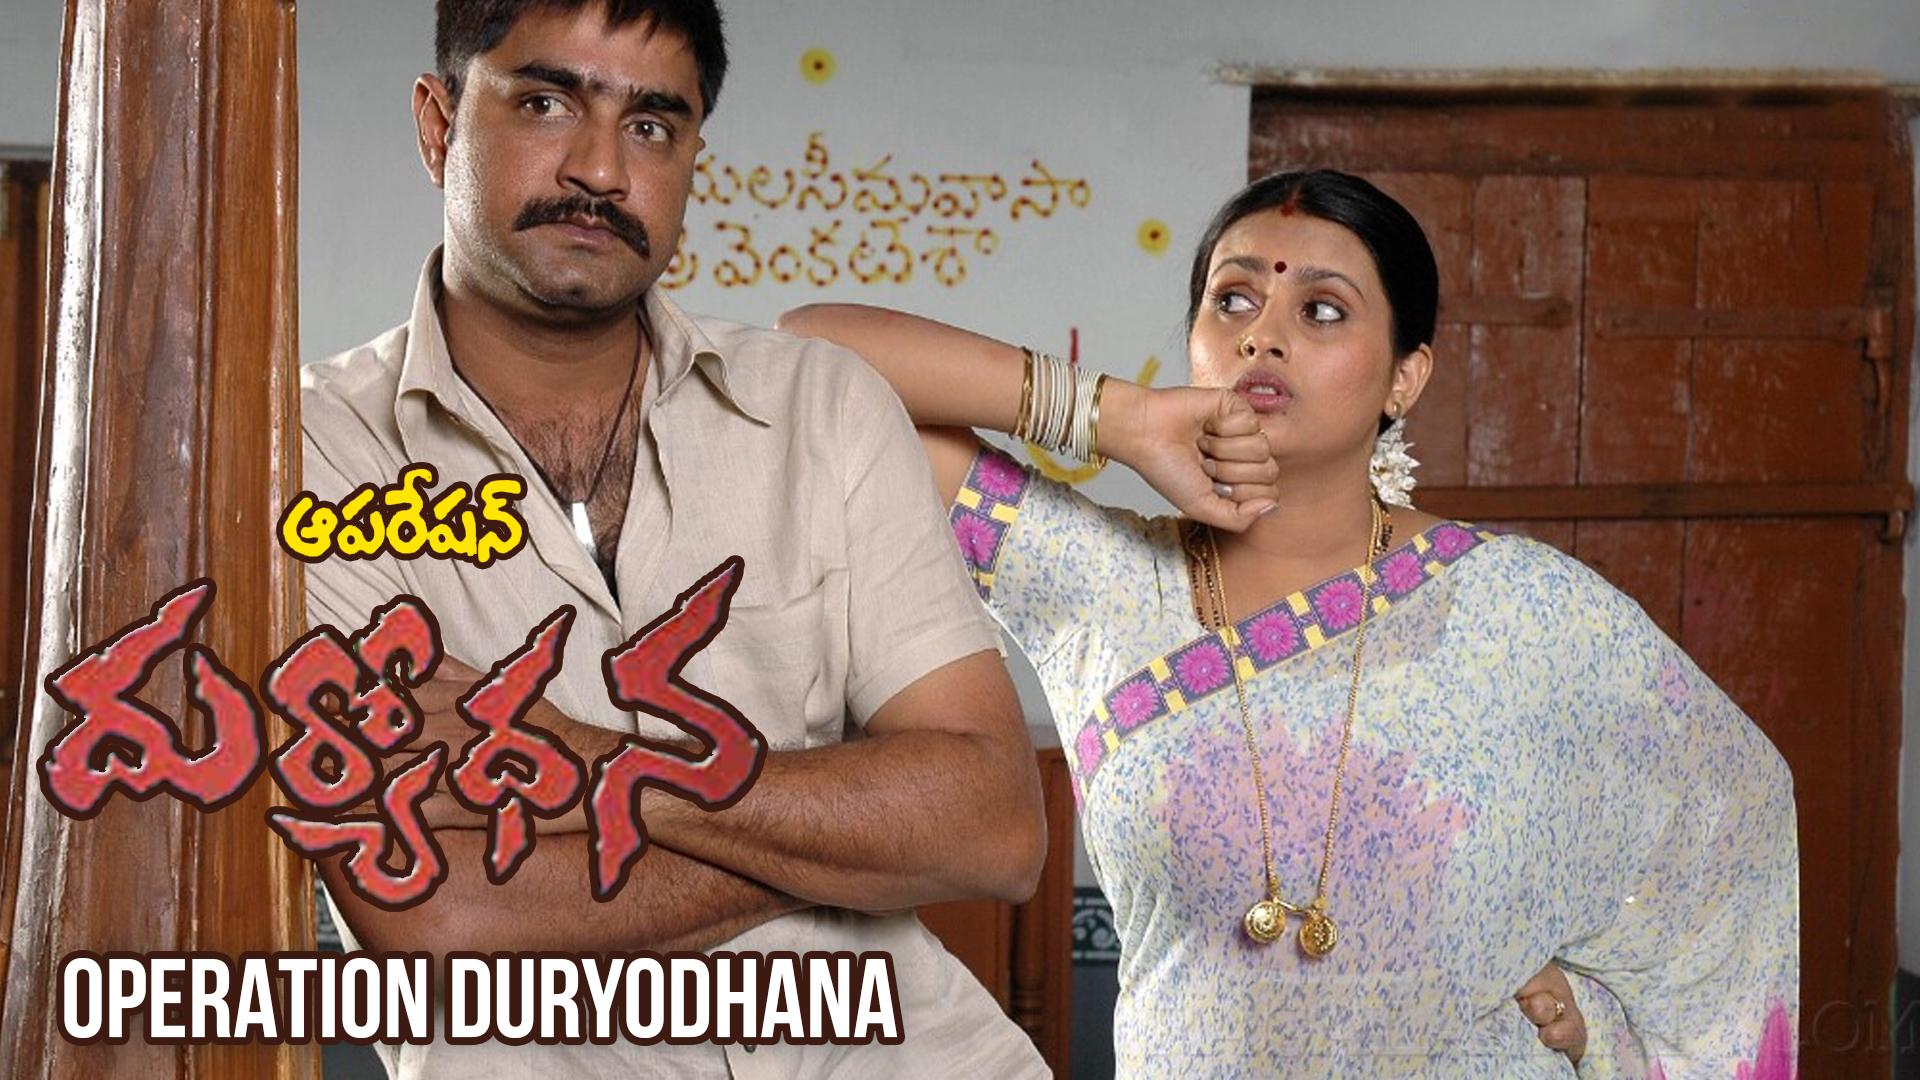 Operation Duryodhana